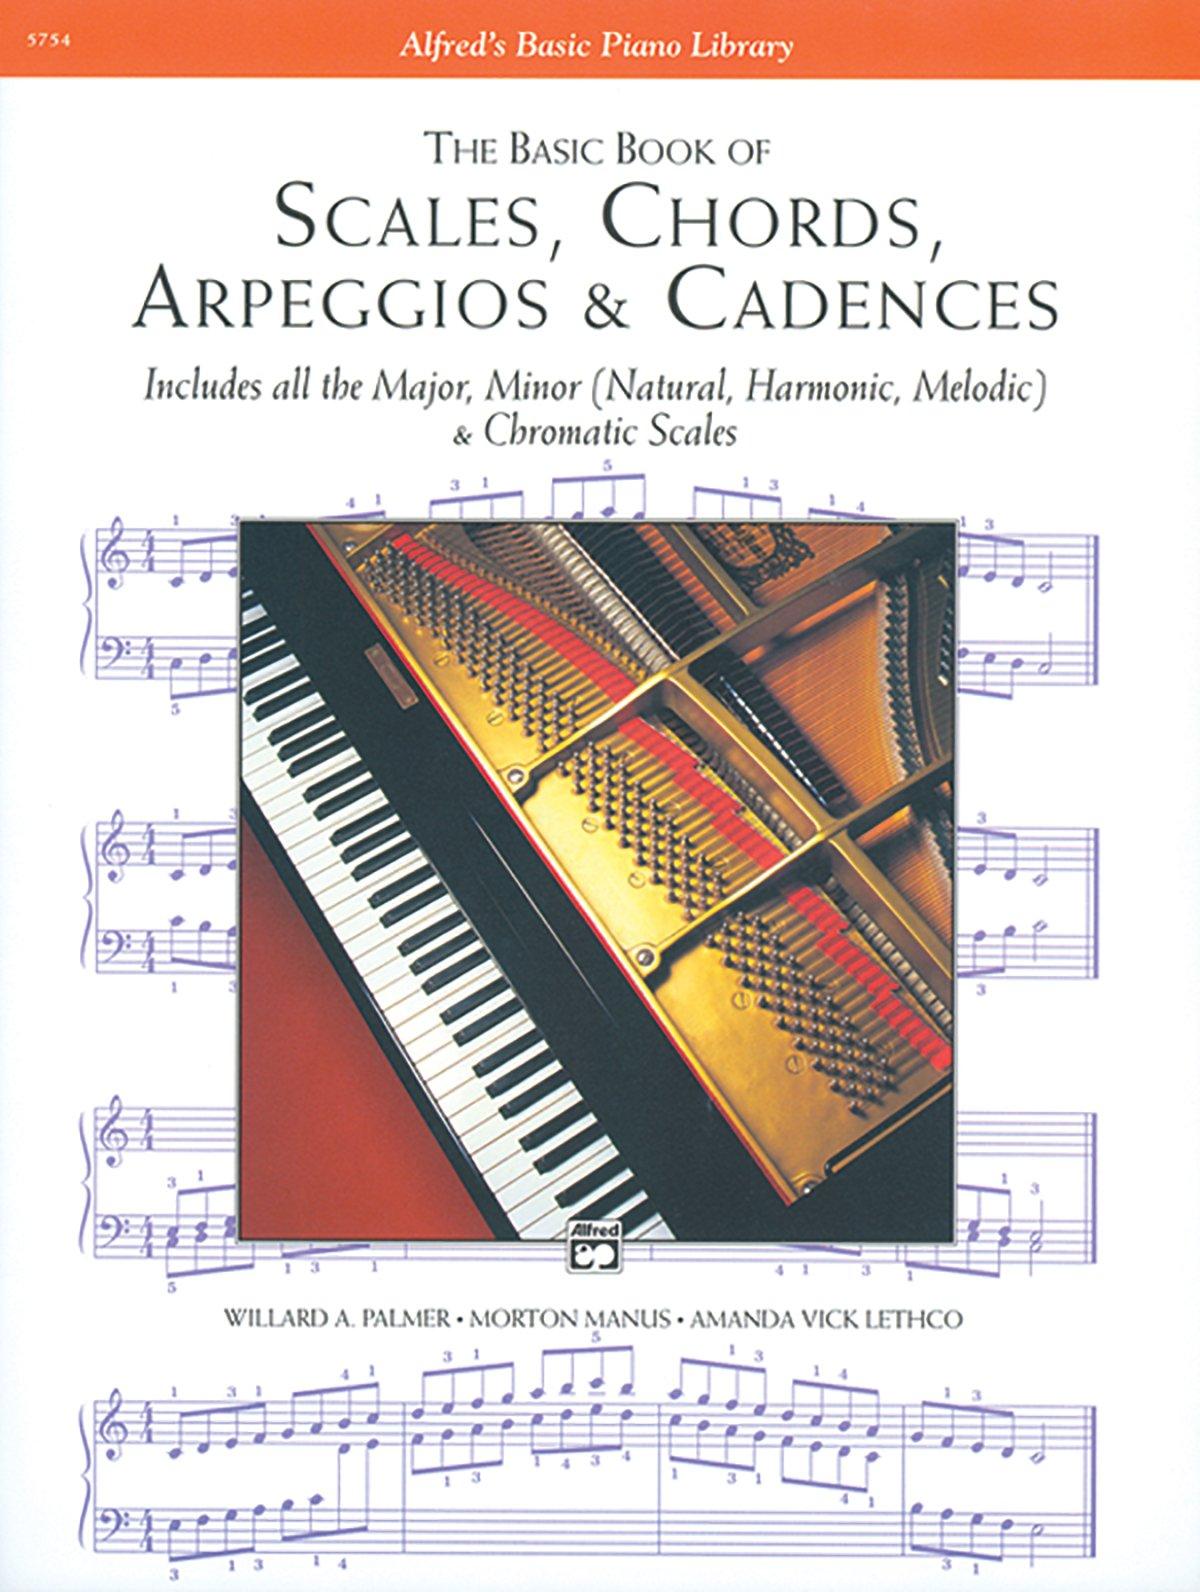 Scales chords arpeggios and cadences basic book alfreds basic scales chords arpeggios and cadences basic book alfreds basic piano library willard a palmer morton manus amanda vick lethco 0038081111247 hexwebz Gallery